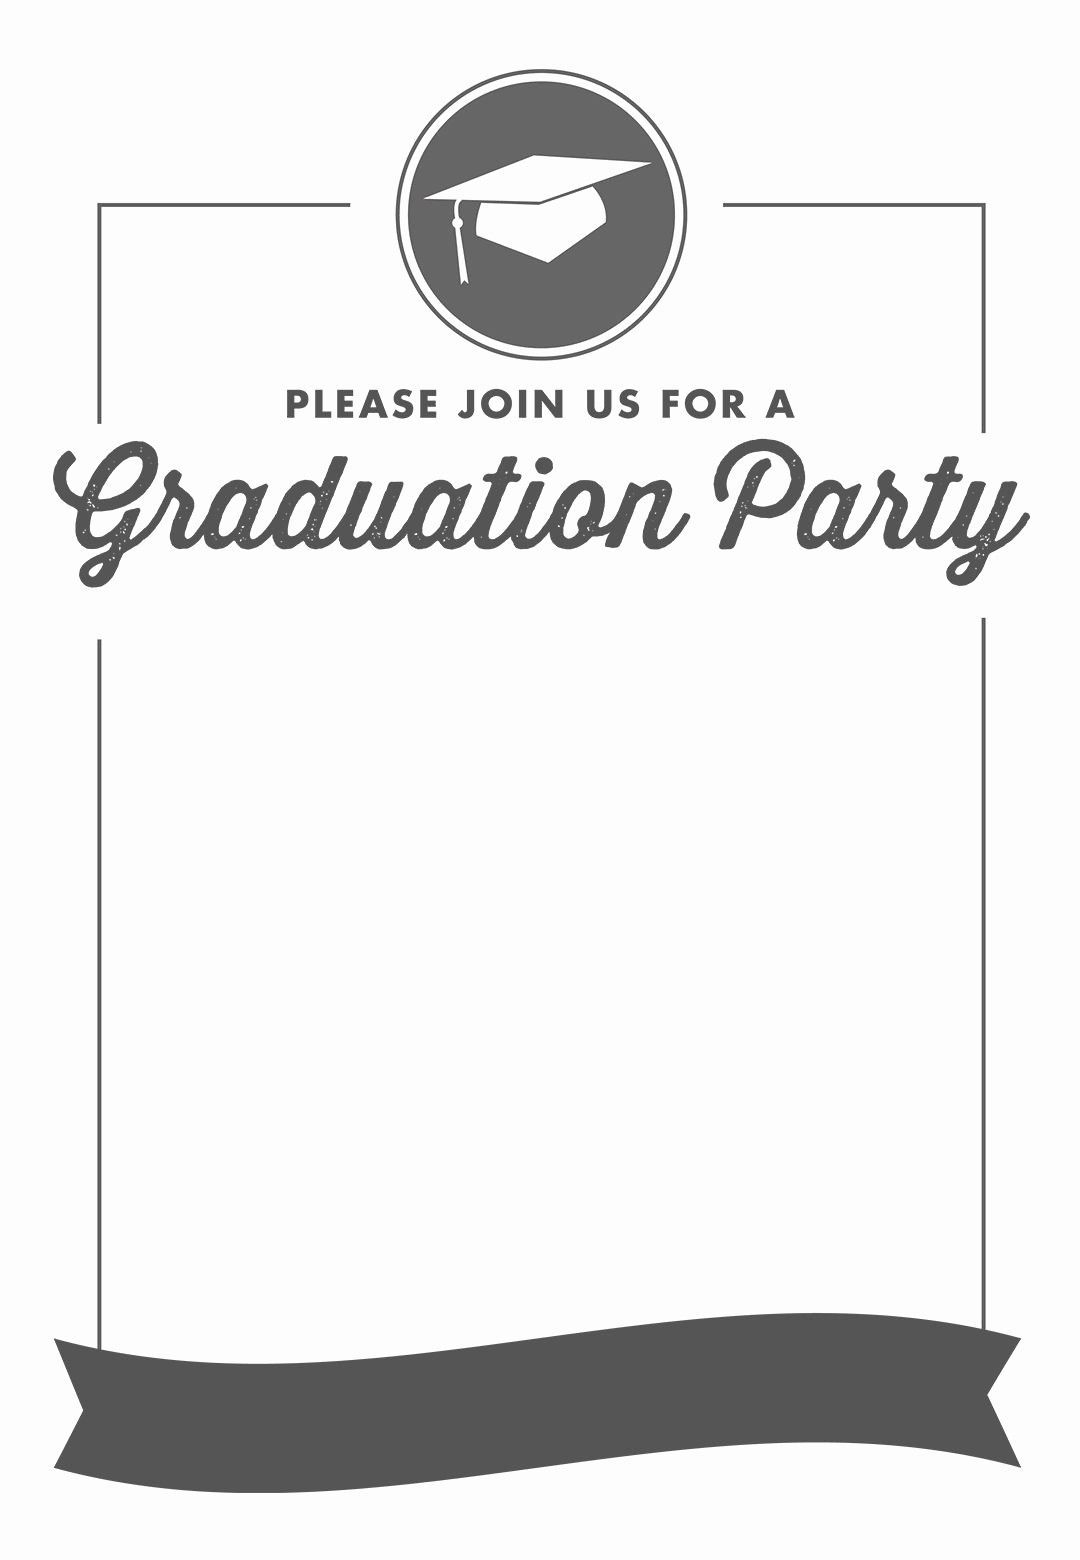 Blank Graduation Invitation Templates Graduation Invitations Template Graduation Announcement Template Graduation Party Invitations Templates